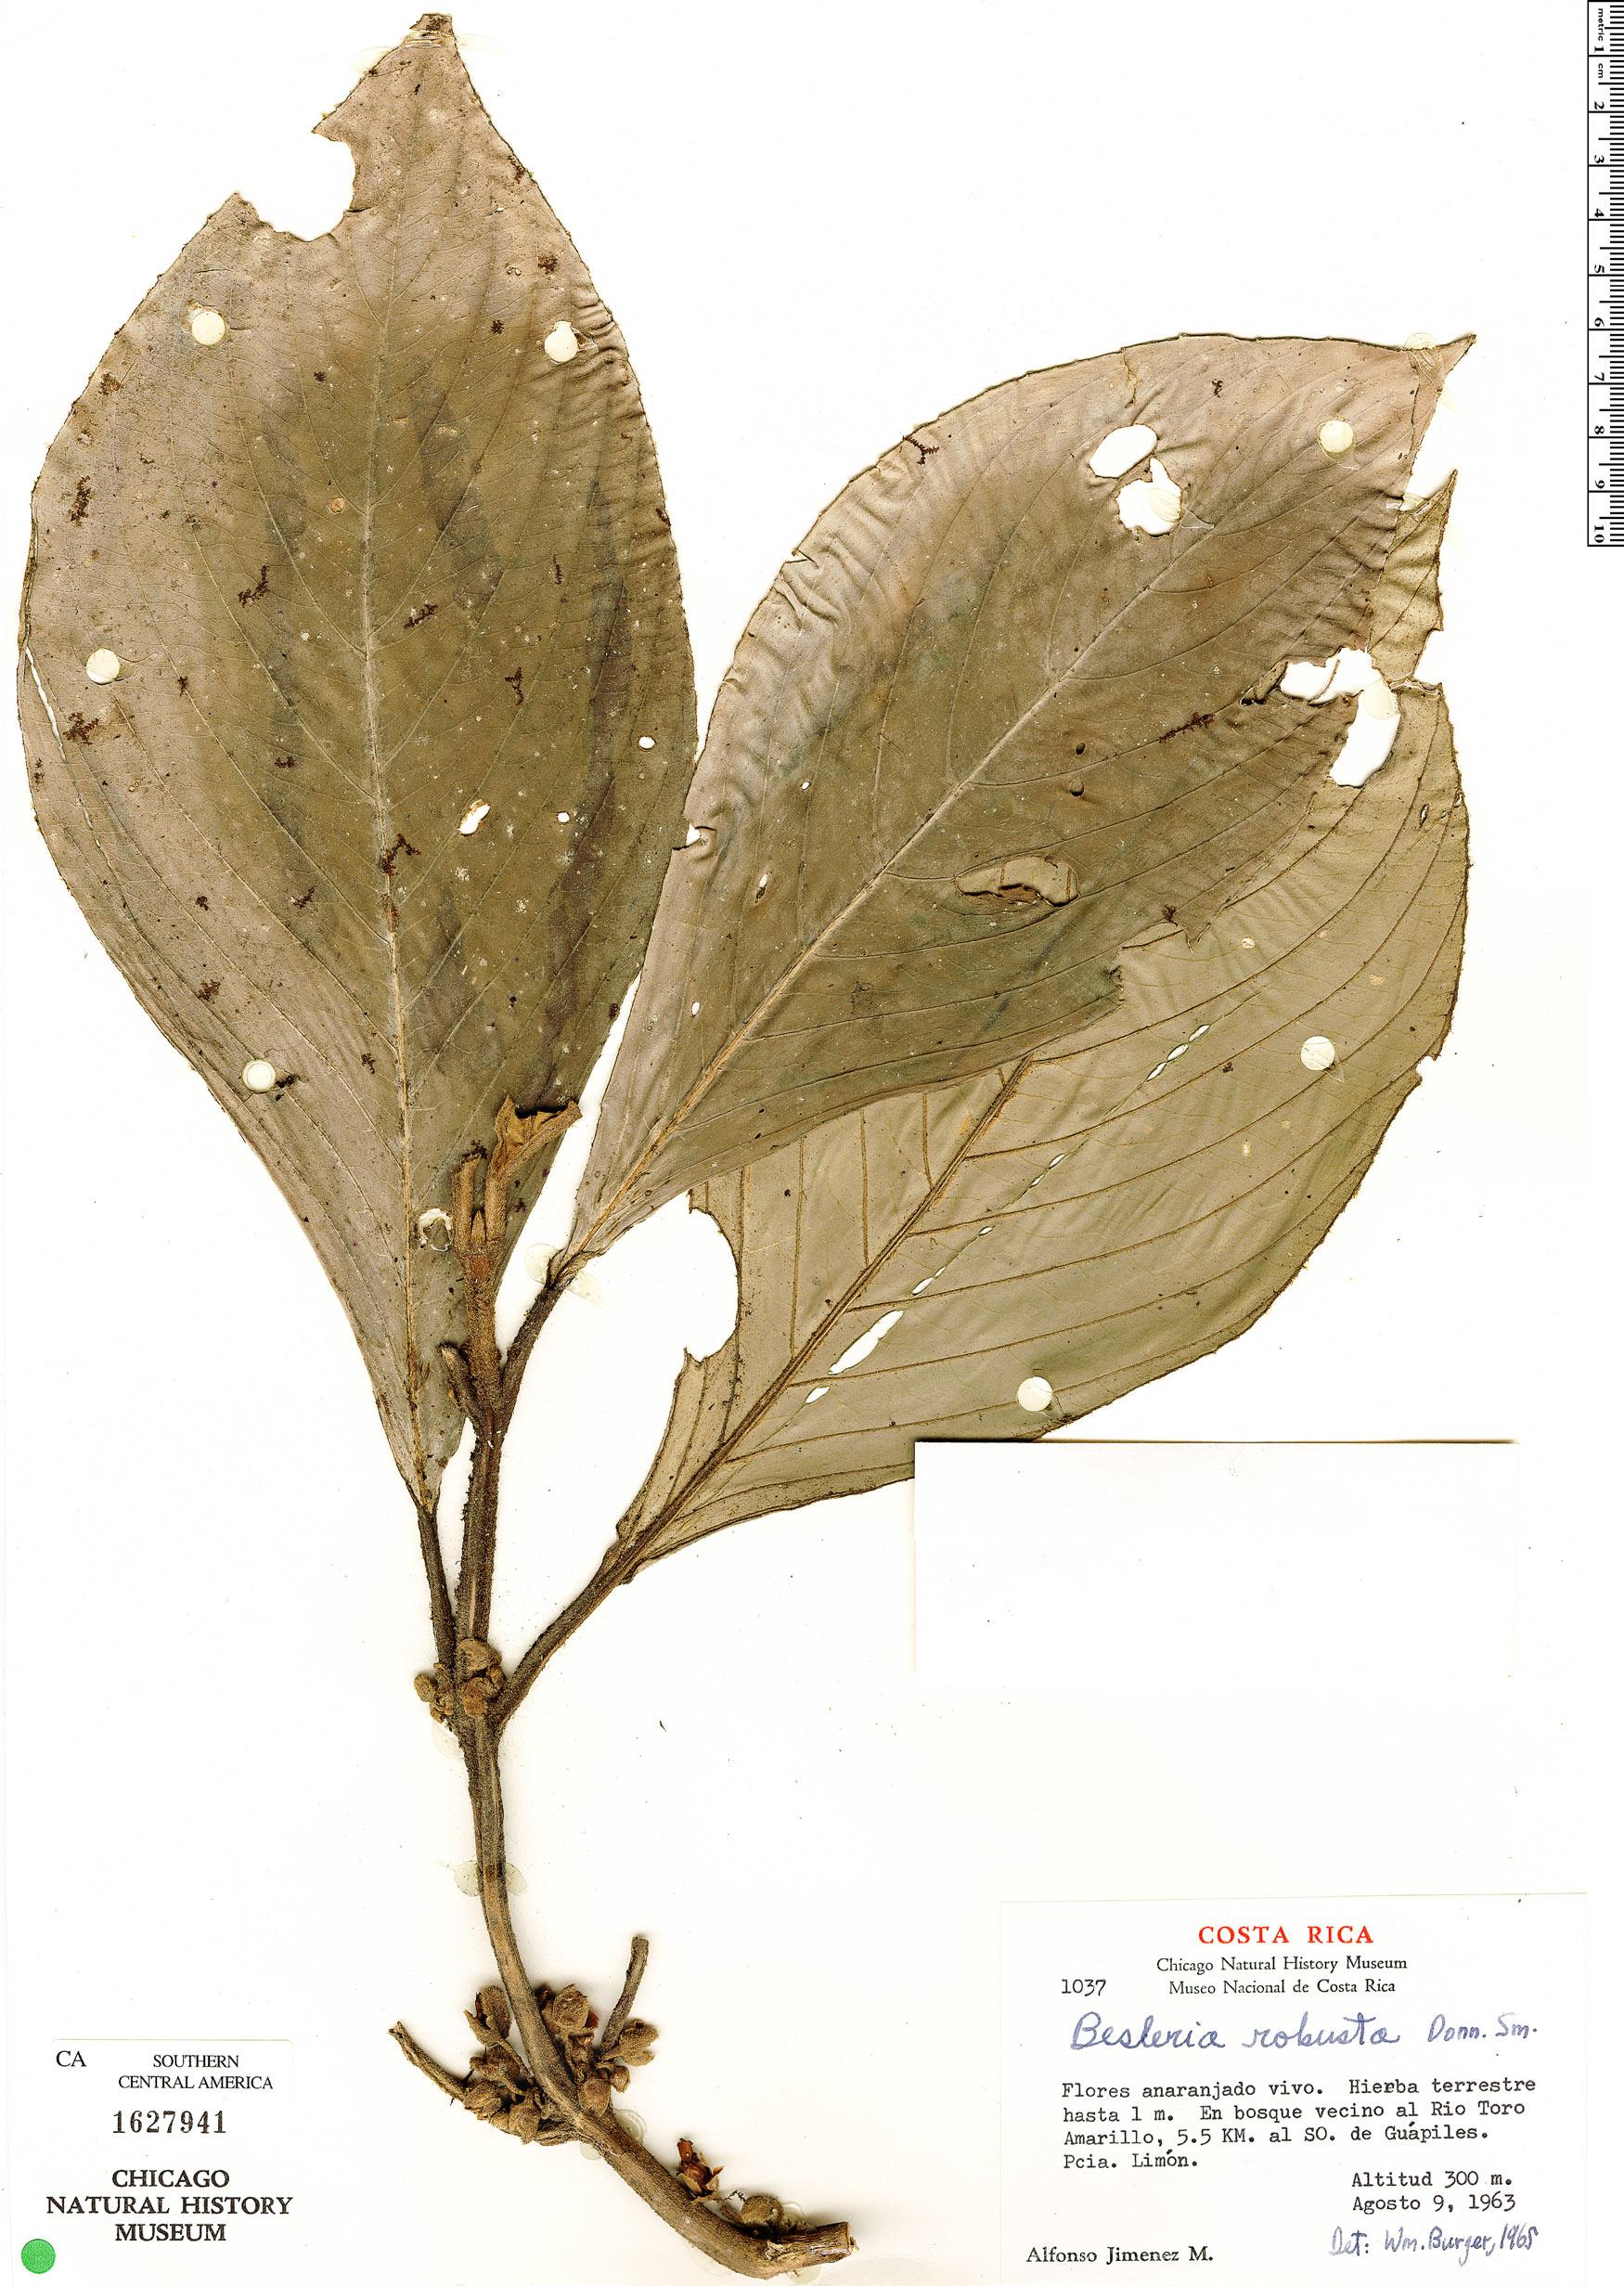 Specimen: Besleria robusta